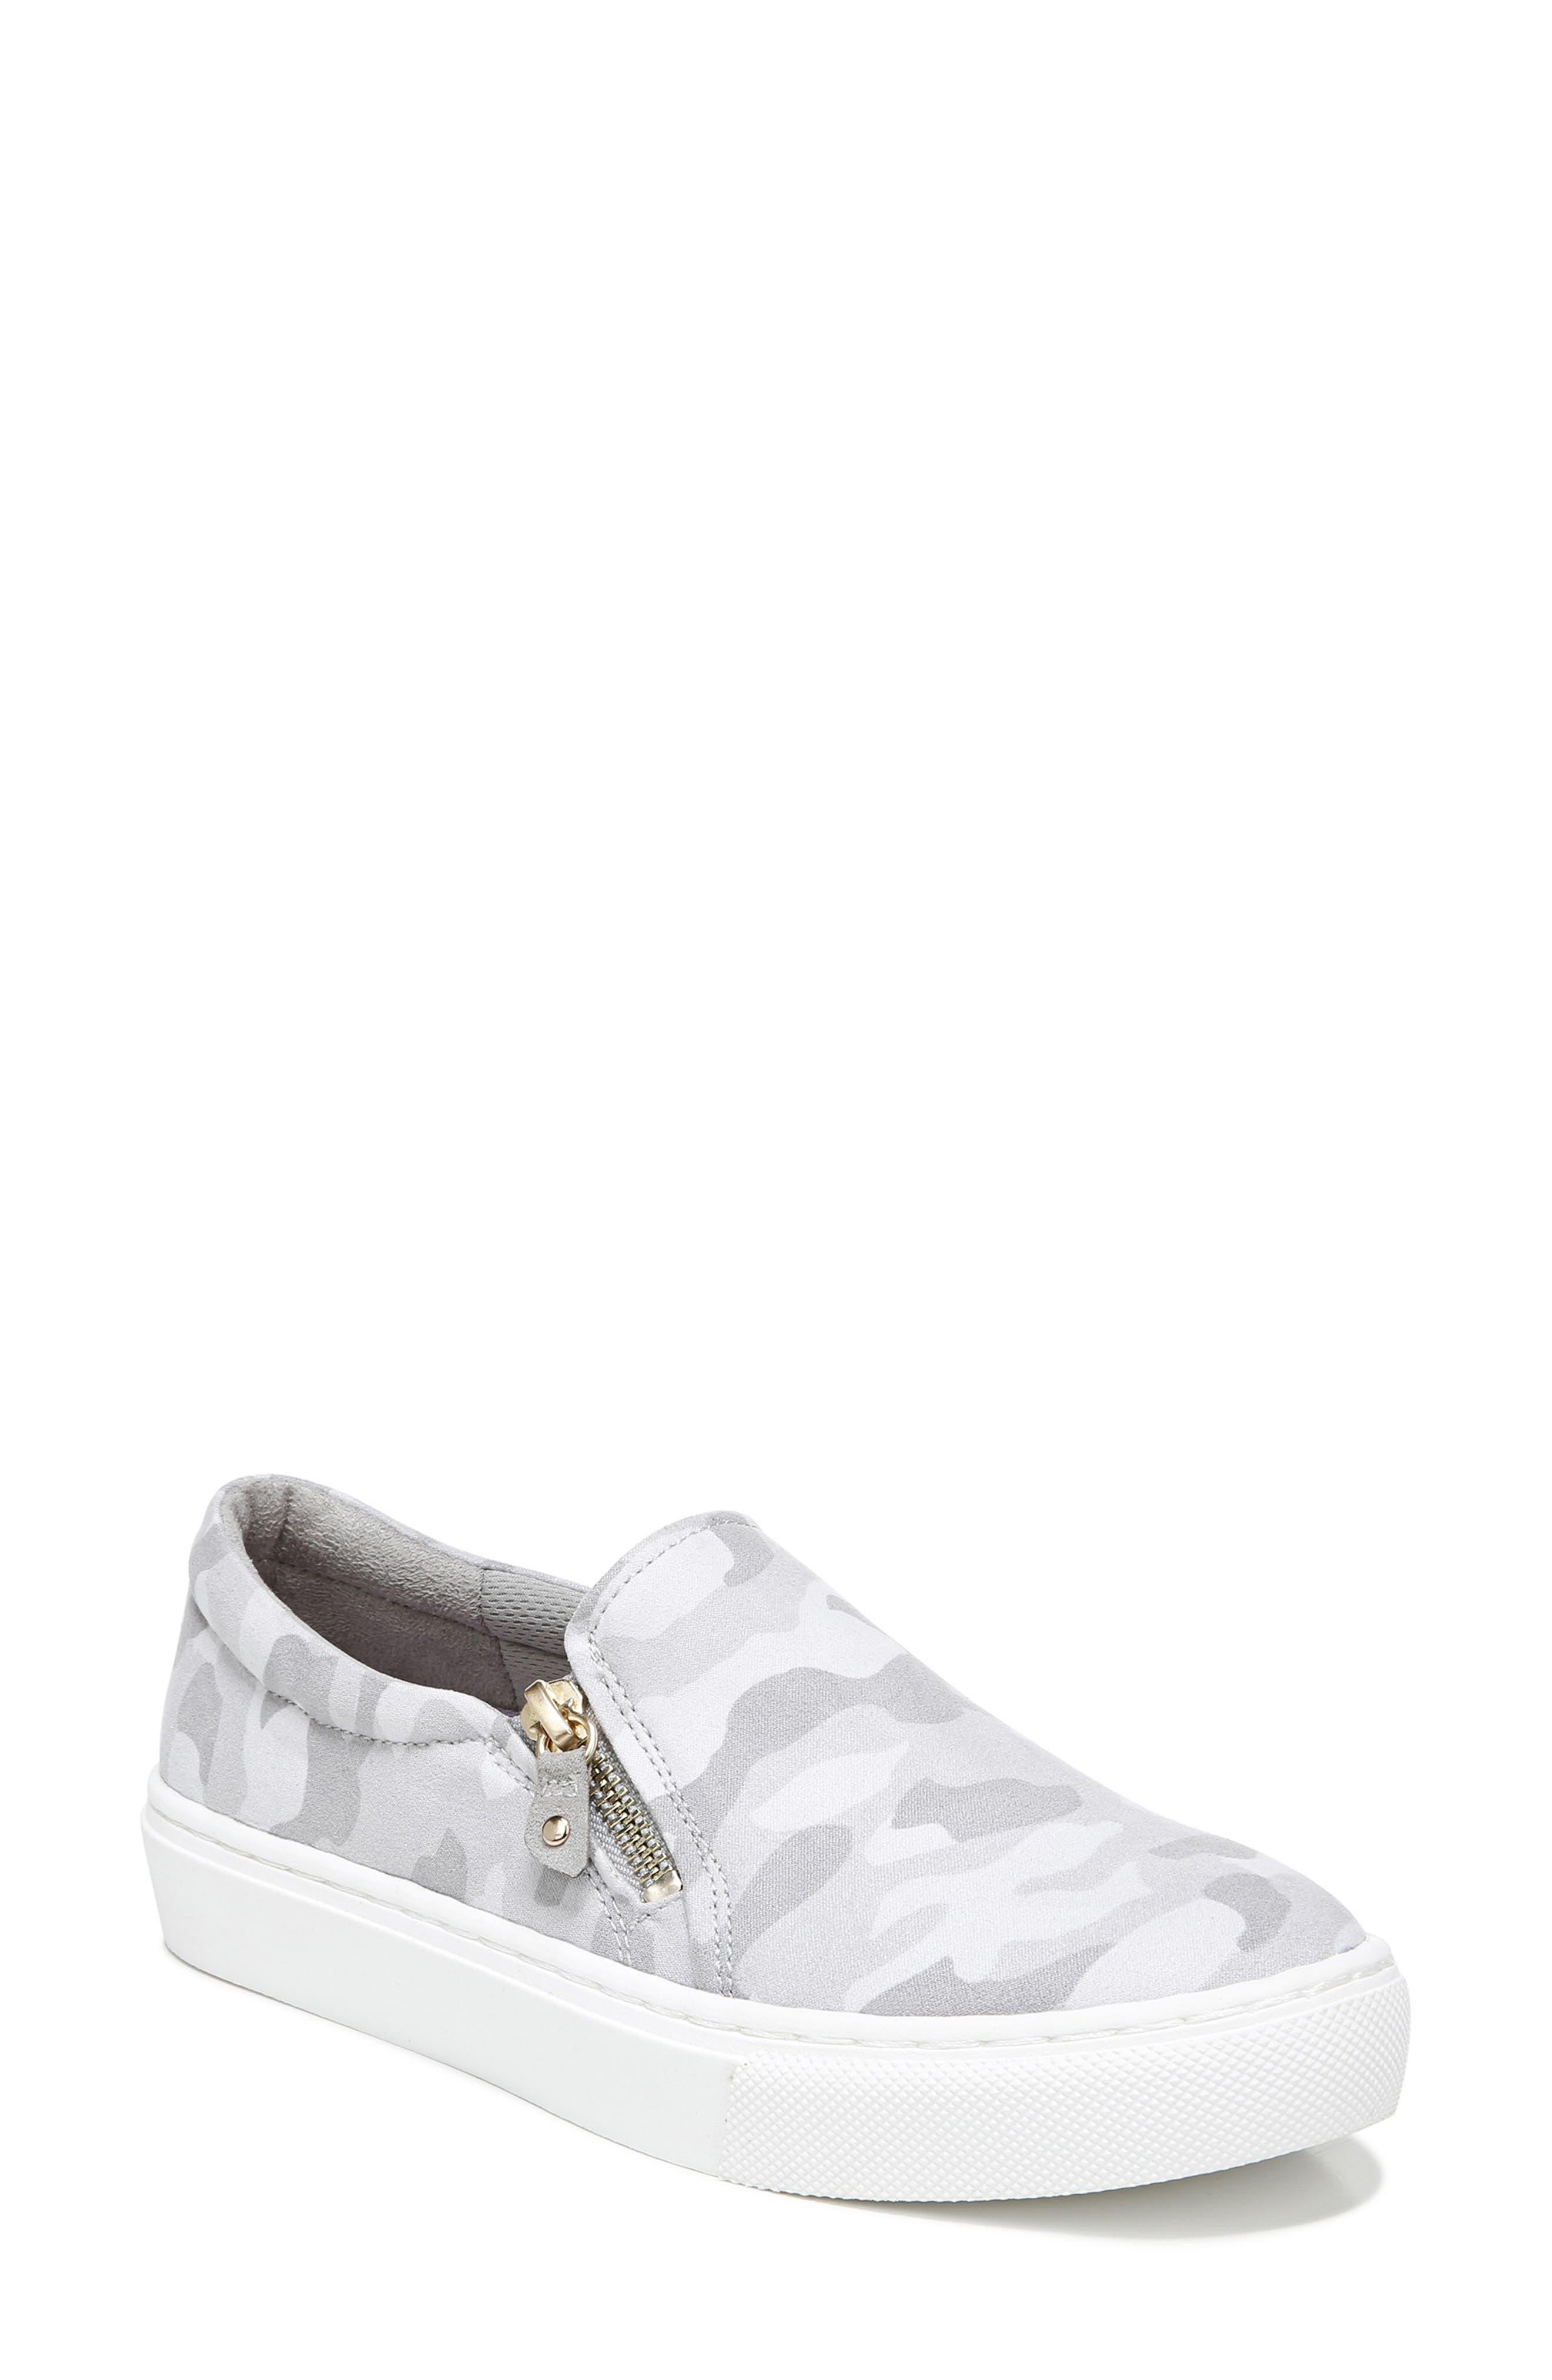 No Chill Slip-On Sneaker